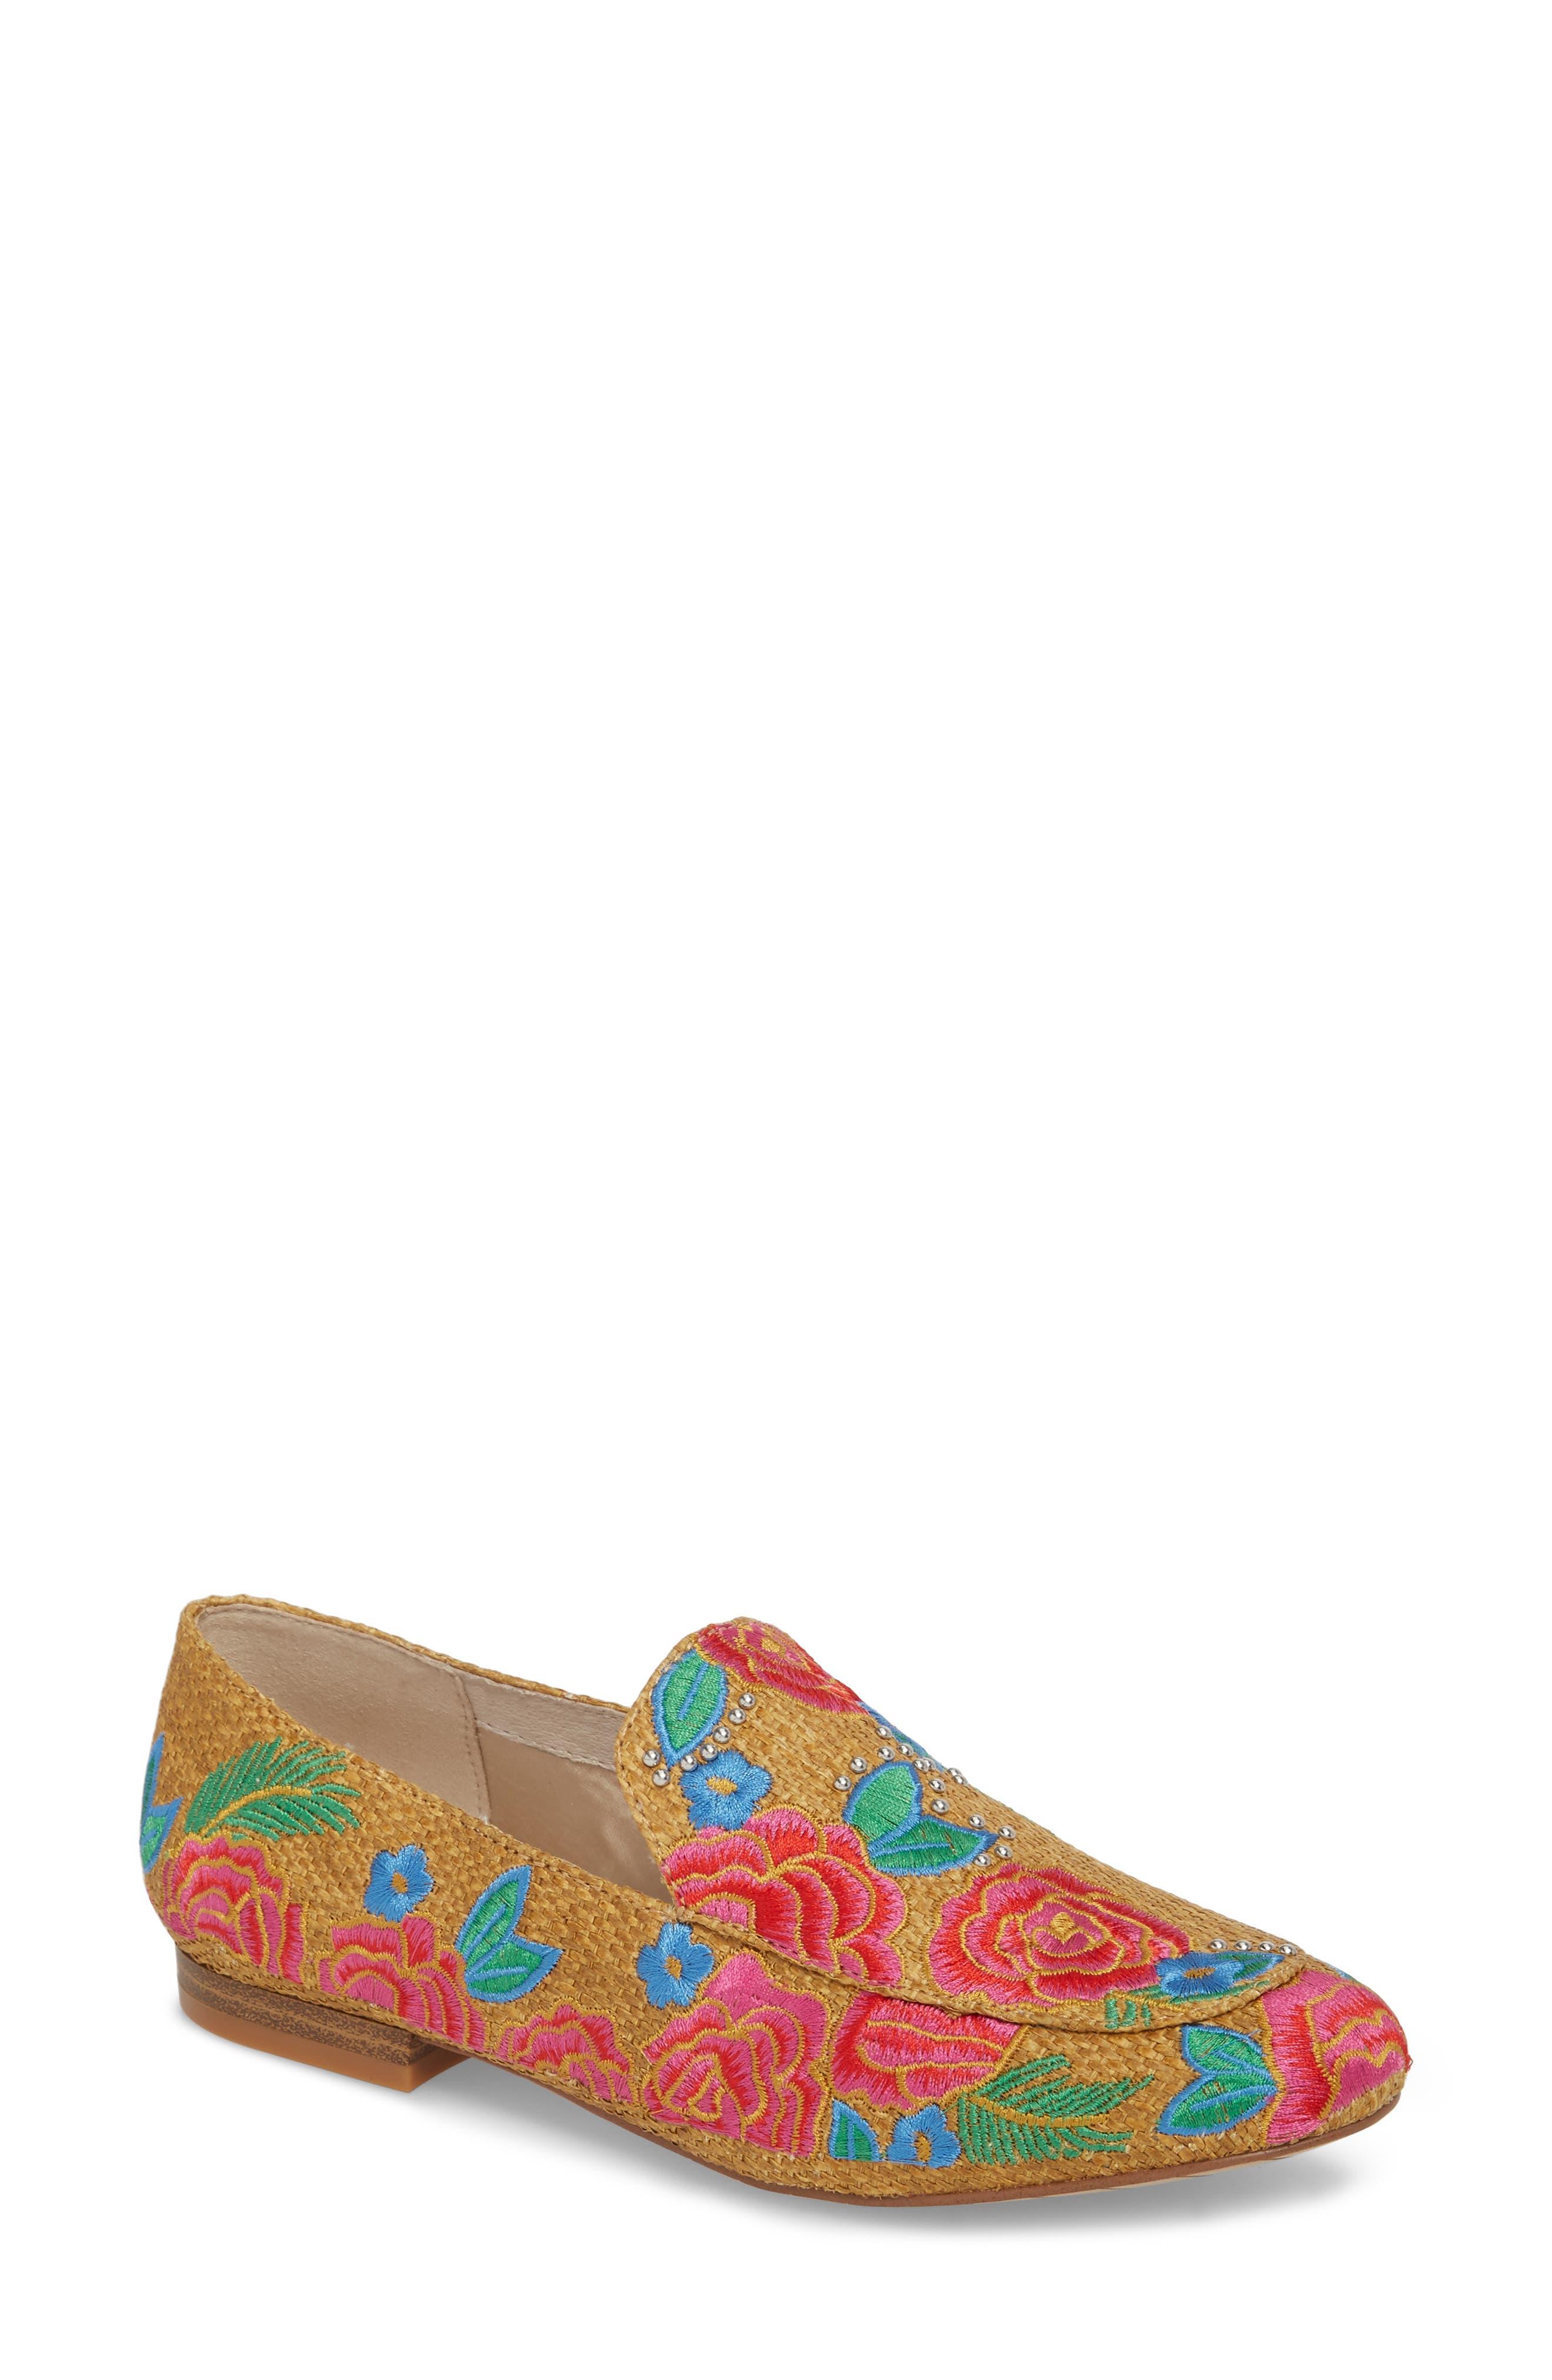 Westley Slip-On,                         Main,                         color, Natural Raffia Fabric